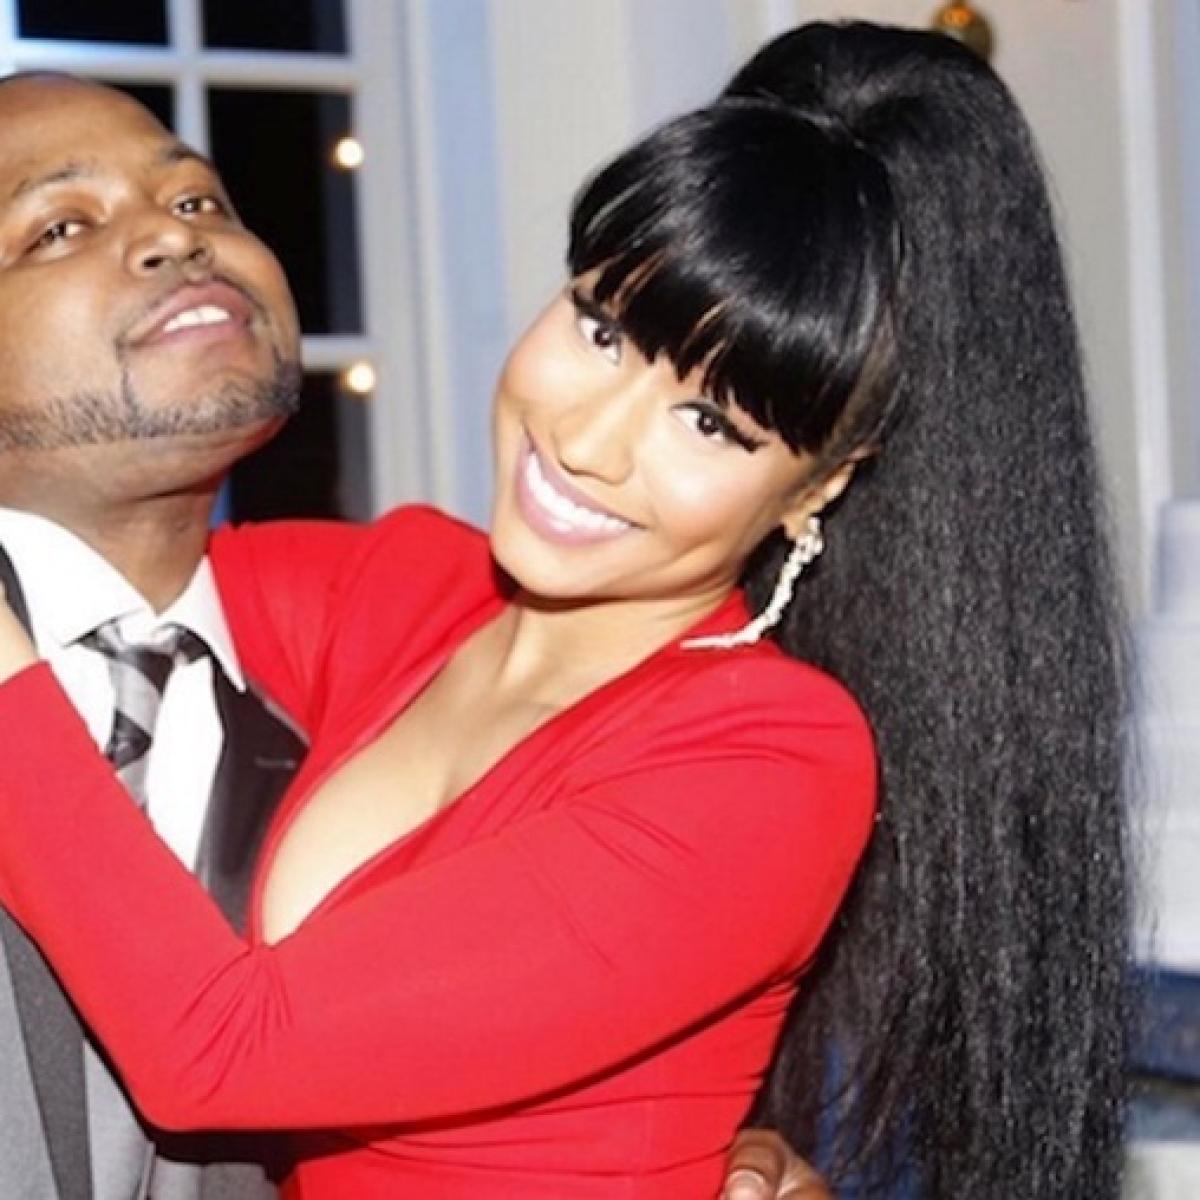 Nicki Minaj's brother to serve 25 years in jail for child rape